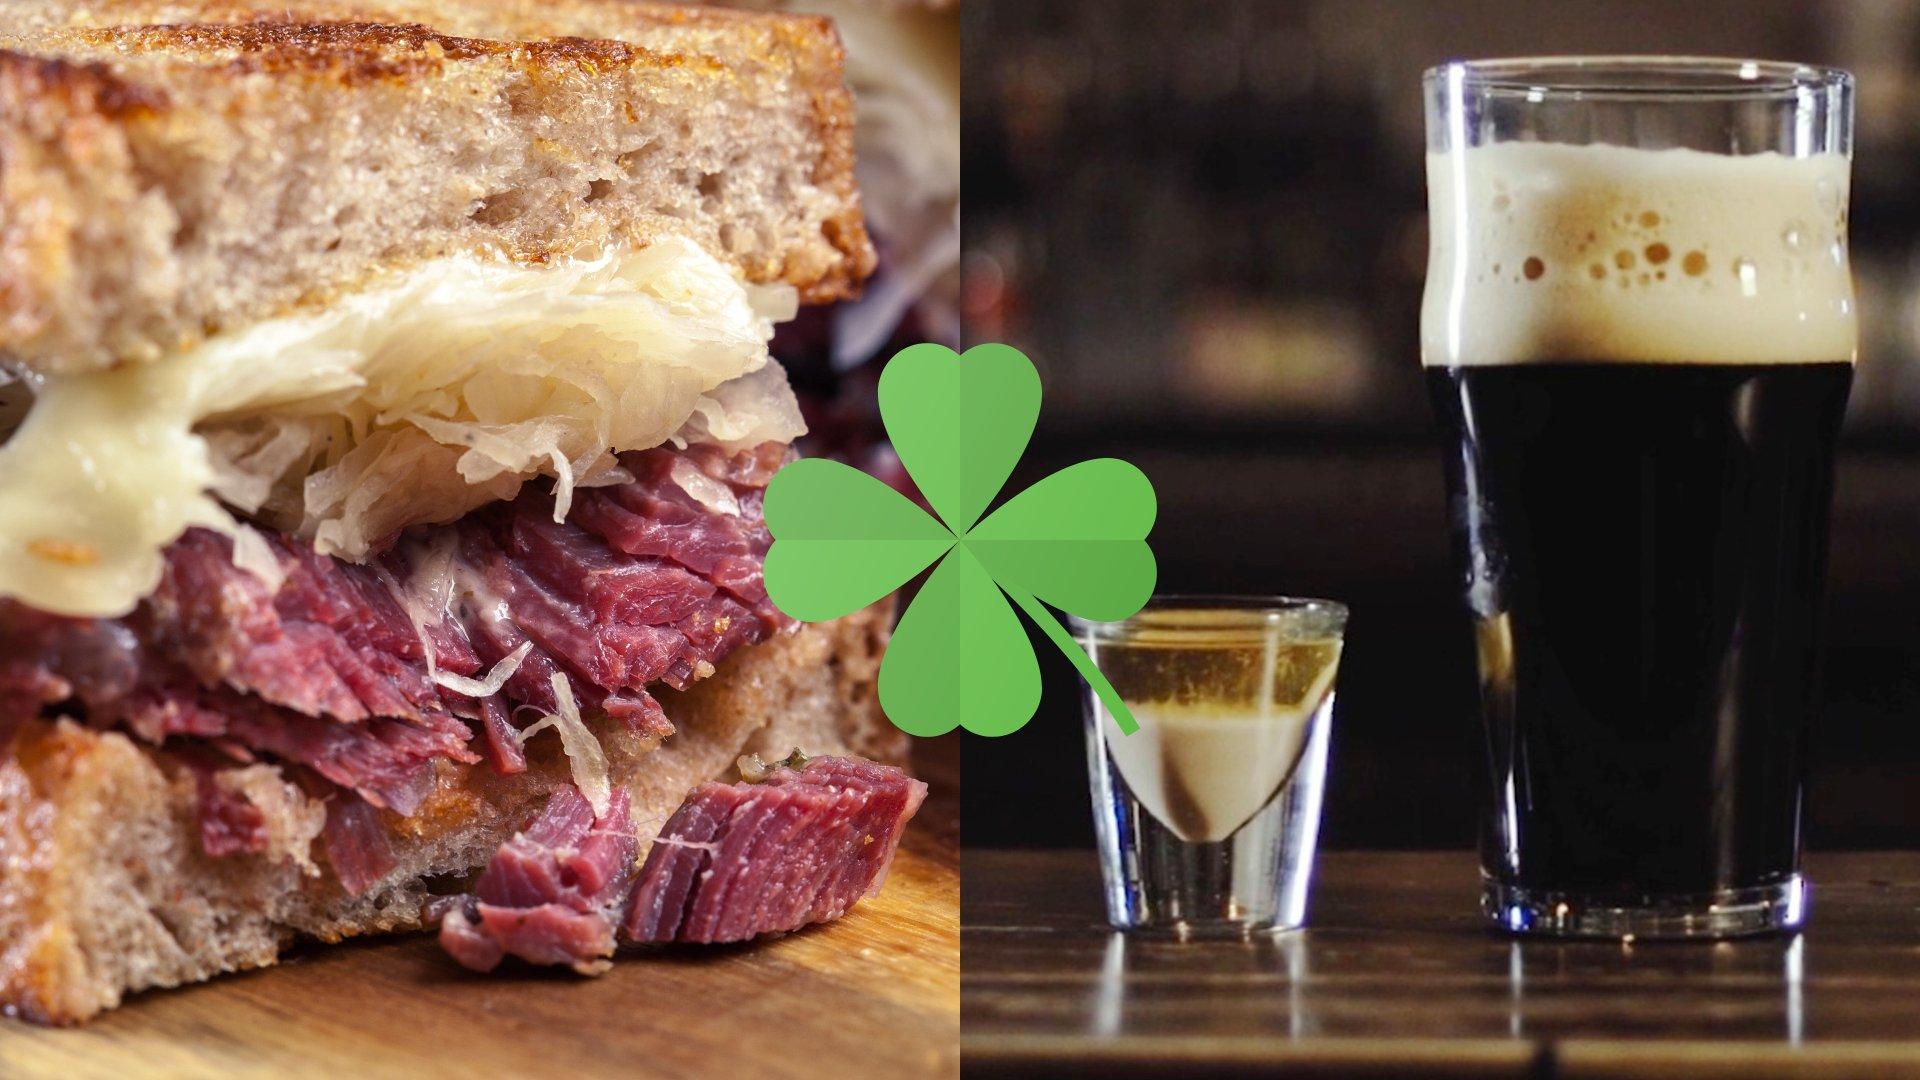 st patrick's day specials, corned beef sandwich, irish slammer